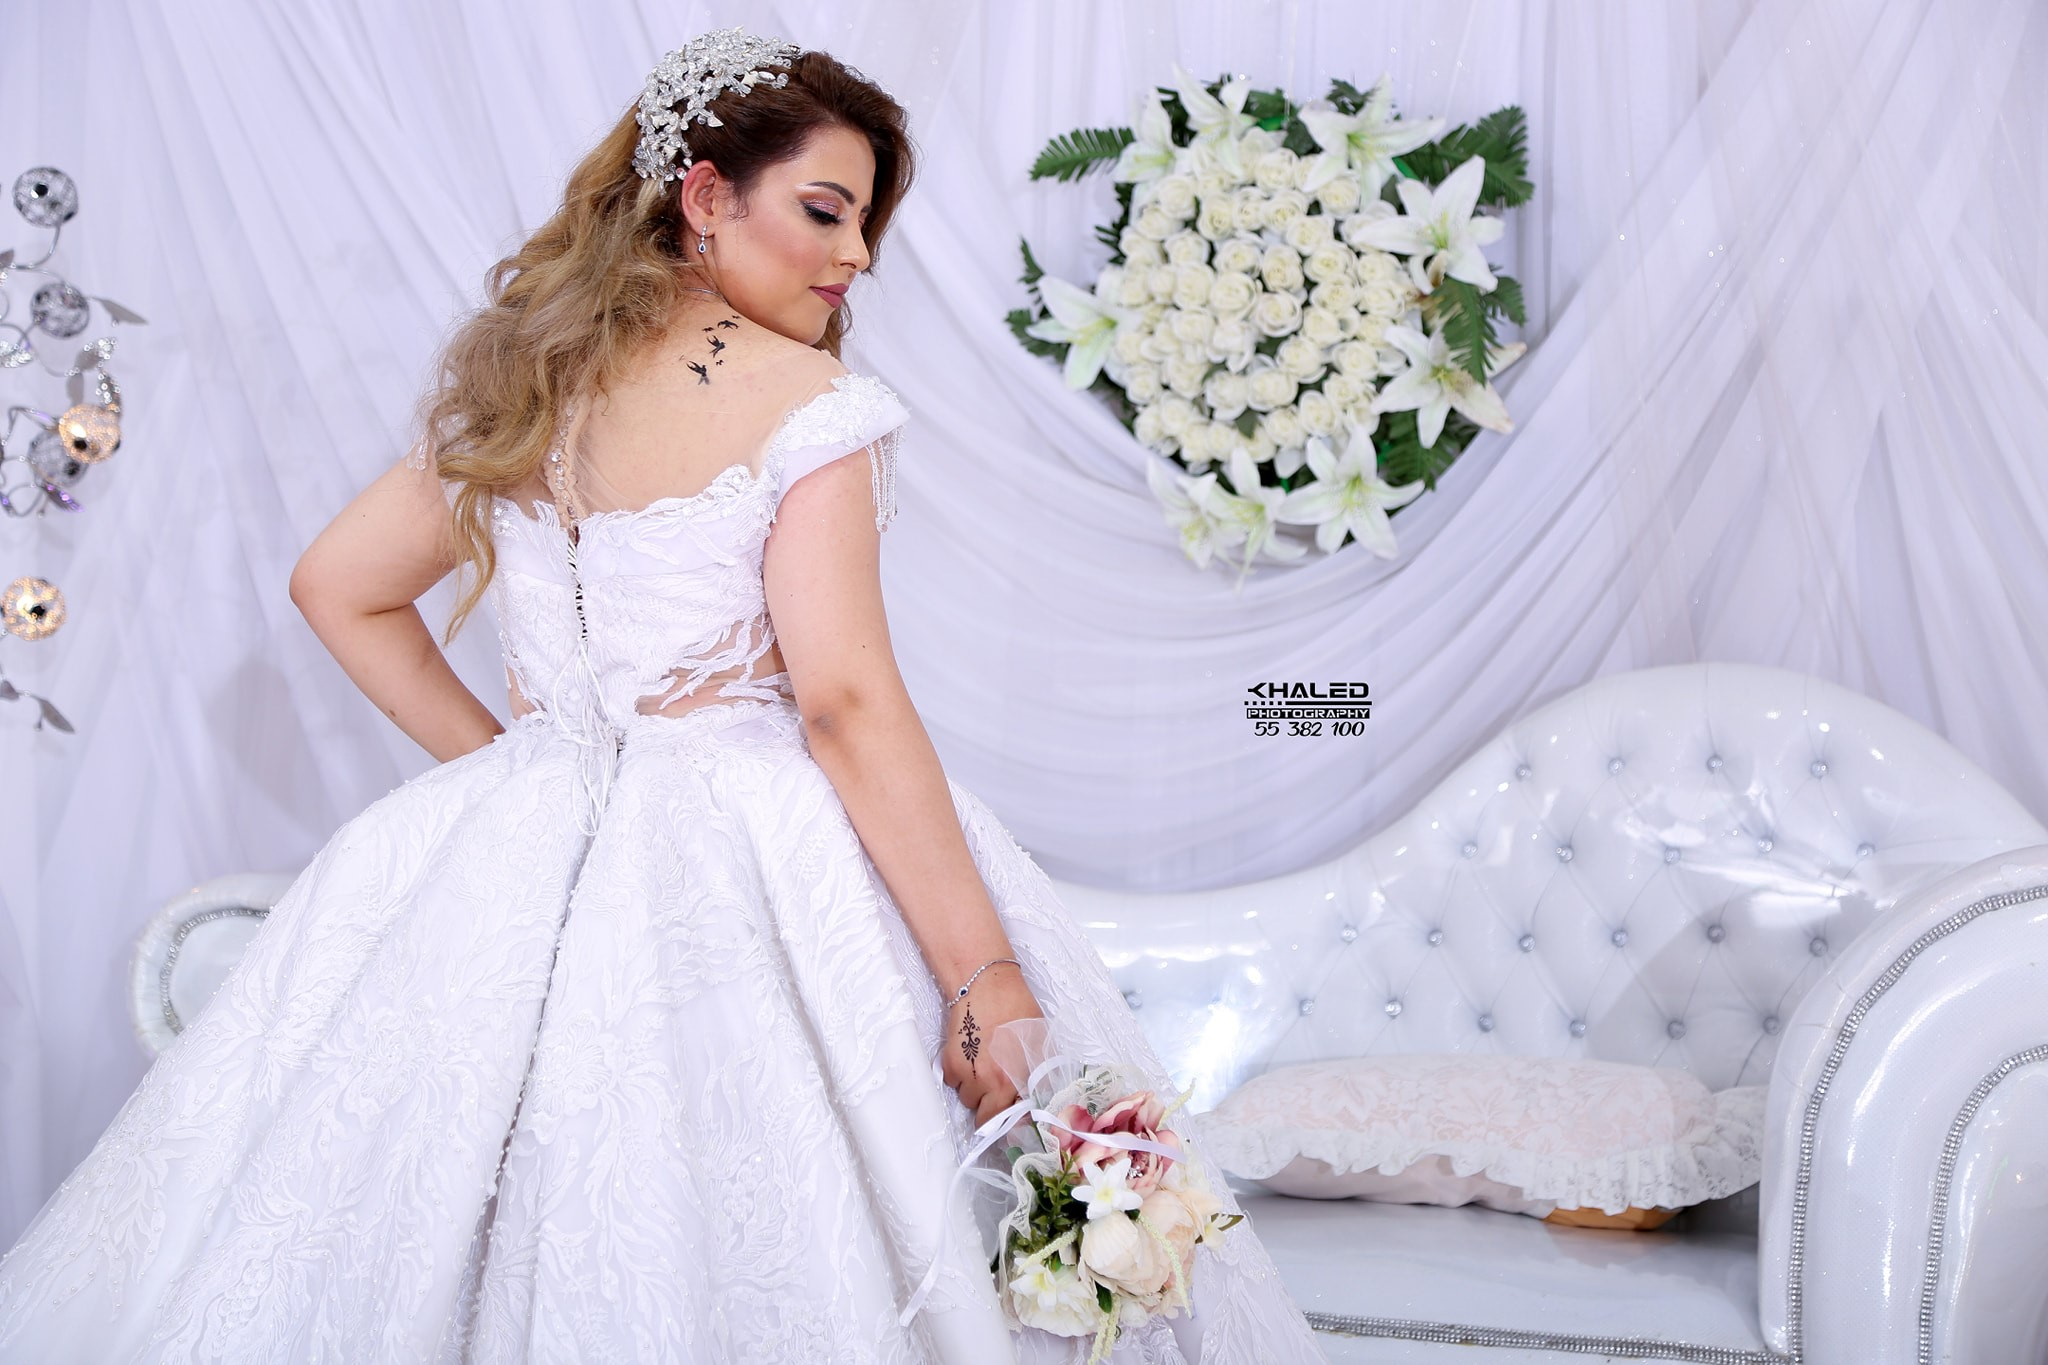 fida15_plus_belles_mariées_tunisiennes_186_2019